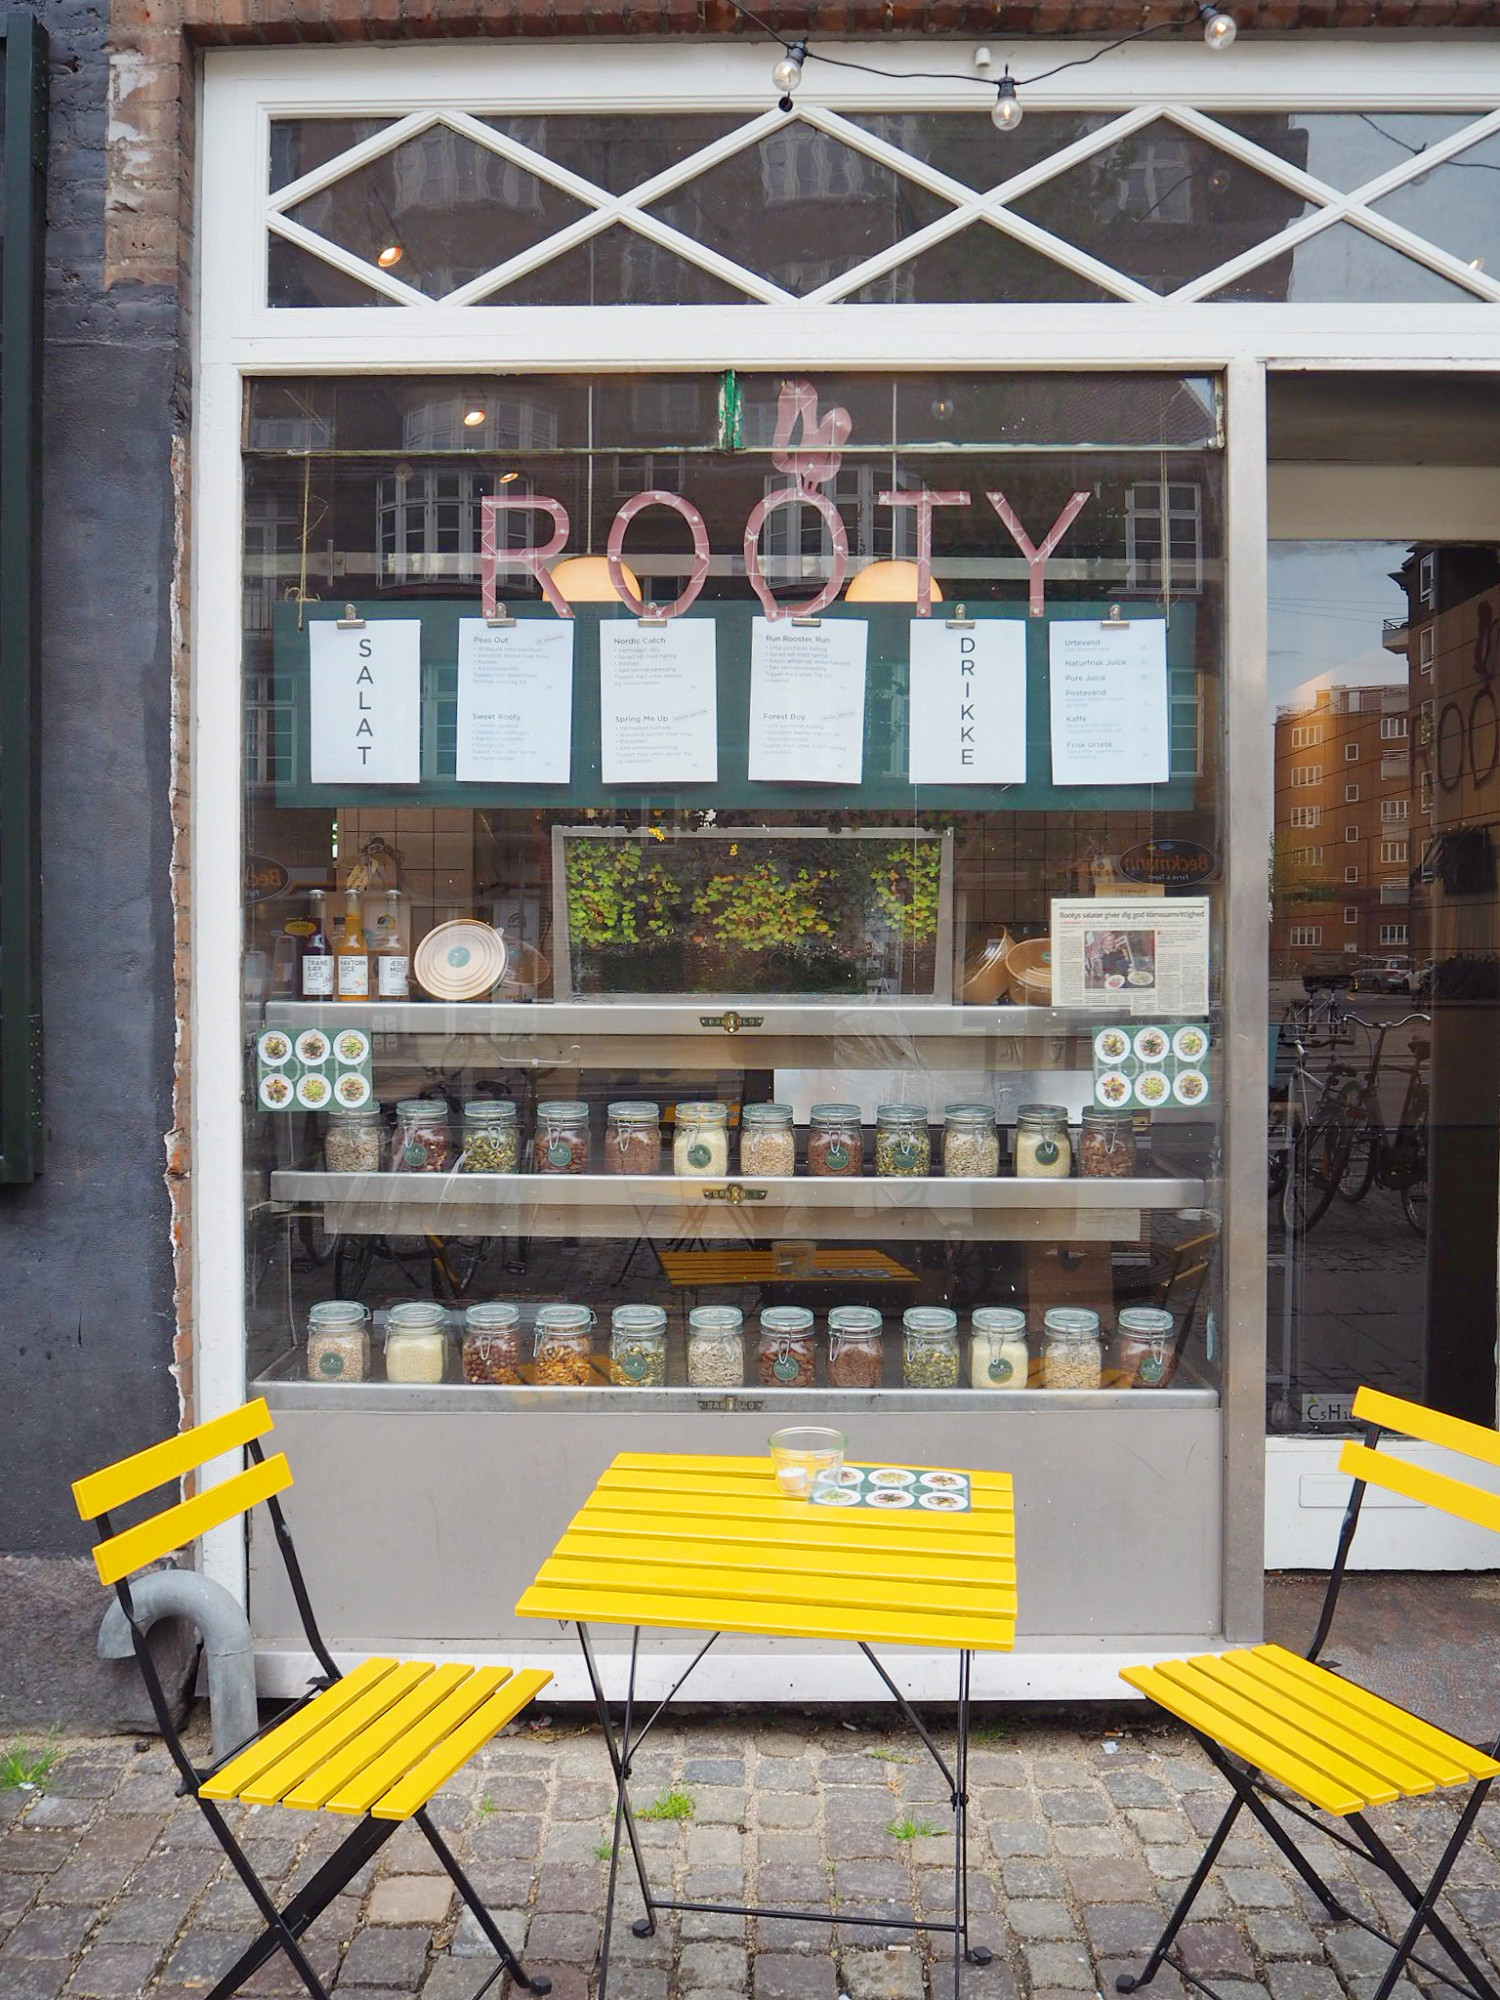 Rooty - lækkert salatsted